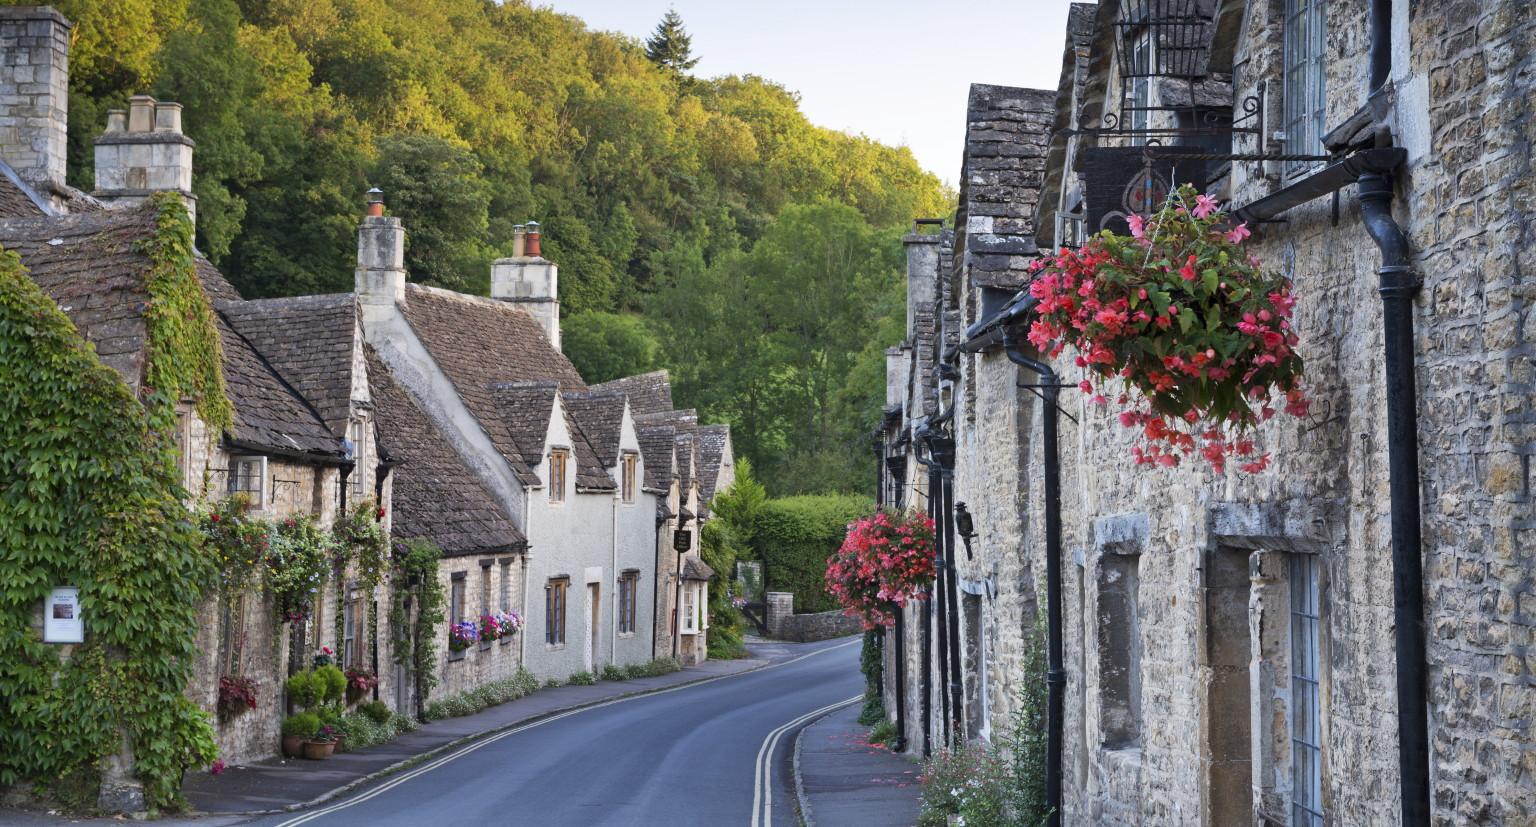 Yup, English villages are pretty darn cute.